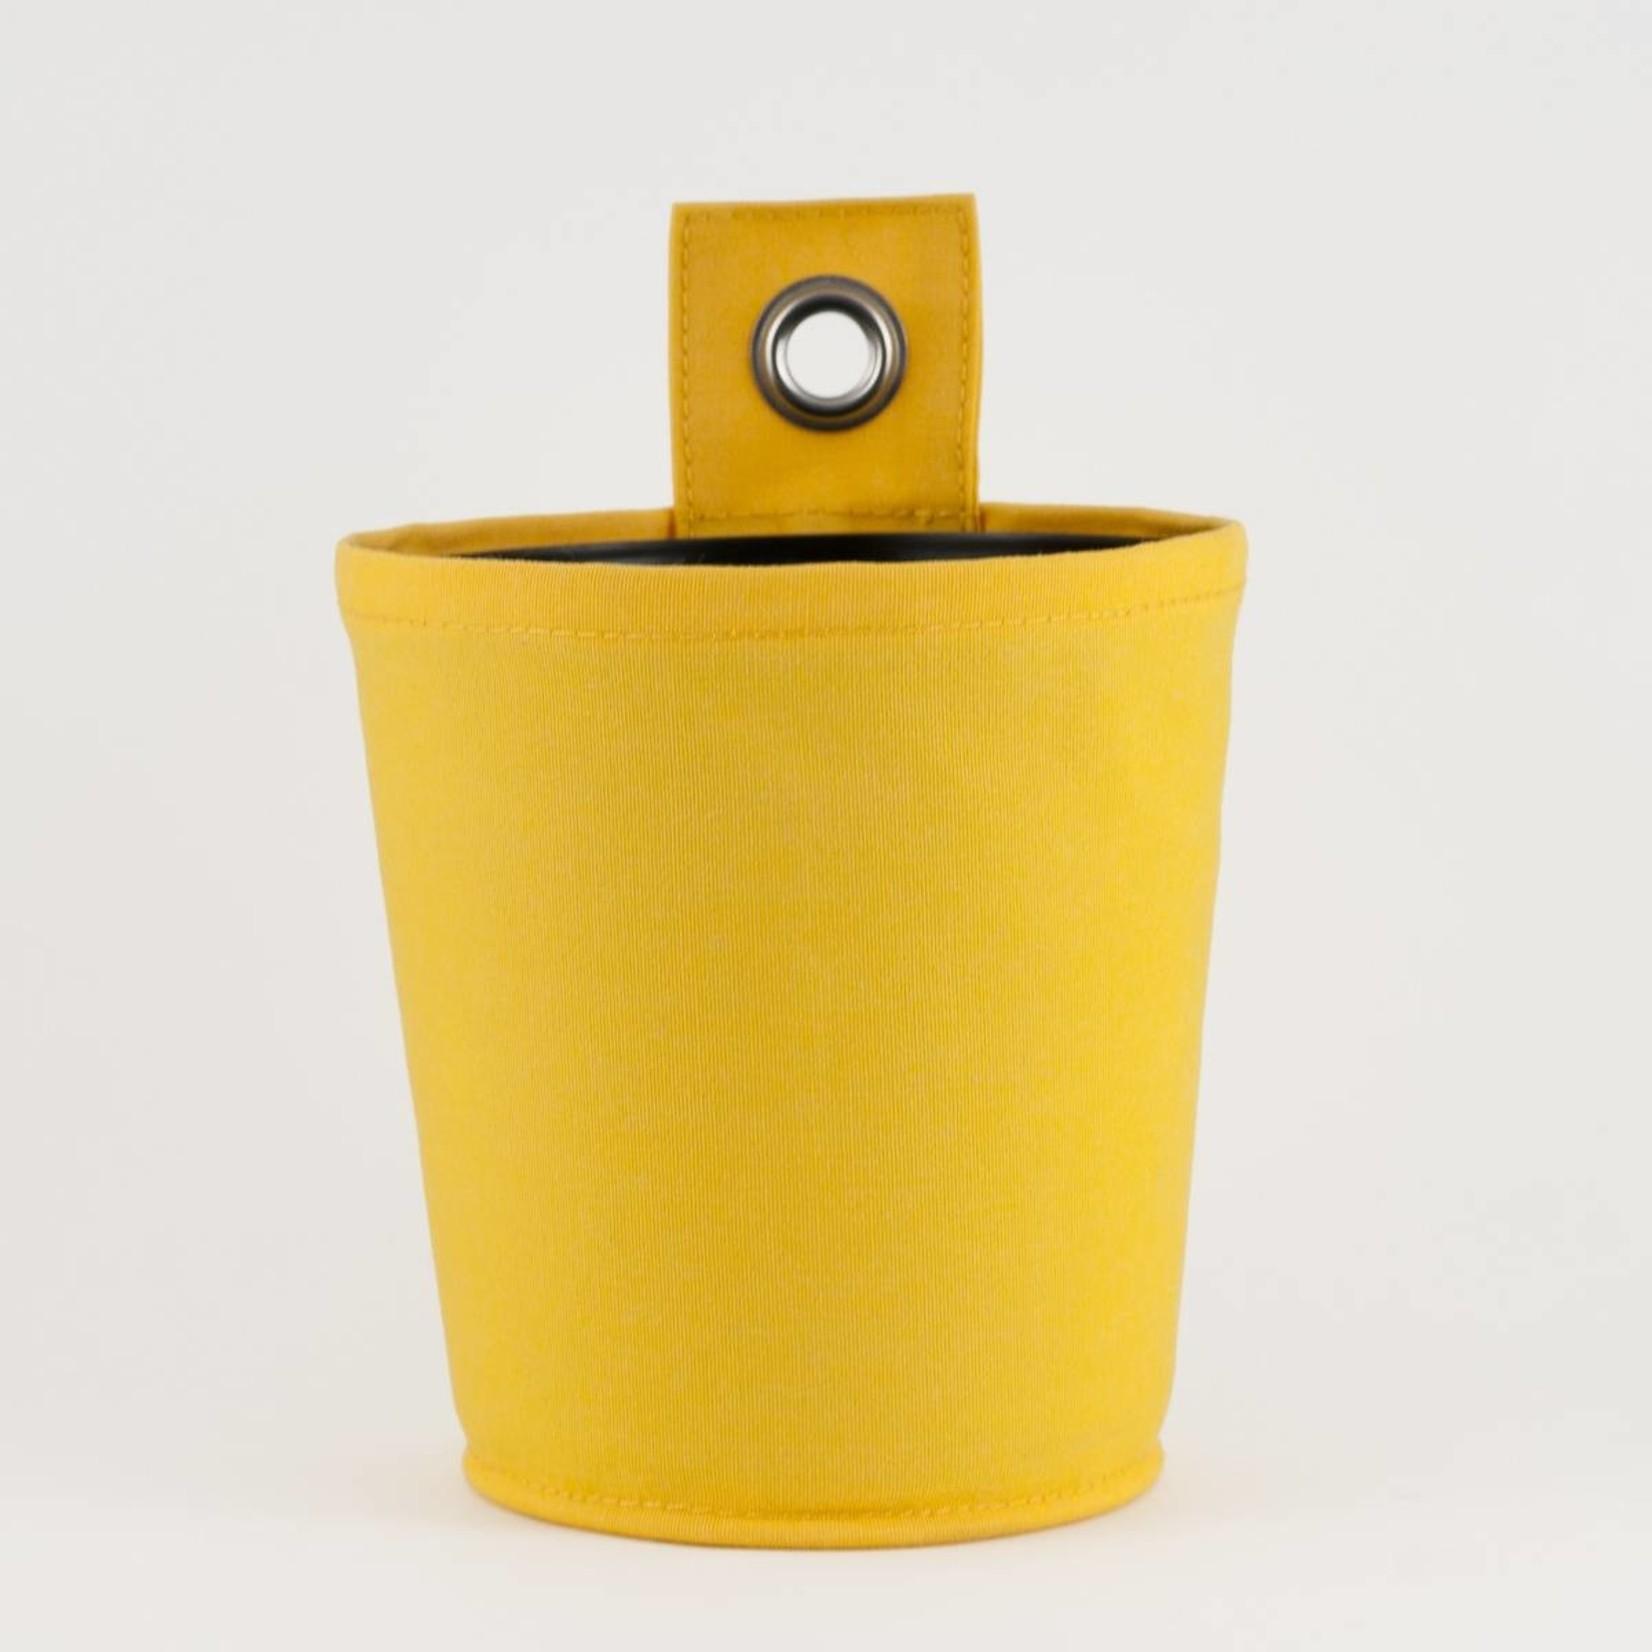 The green pot yellow